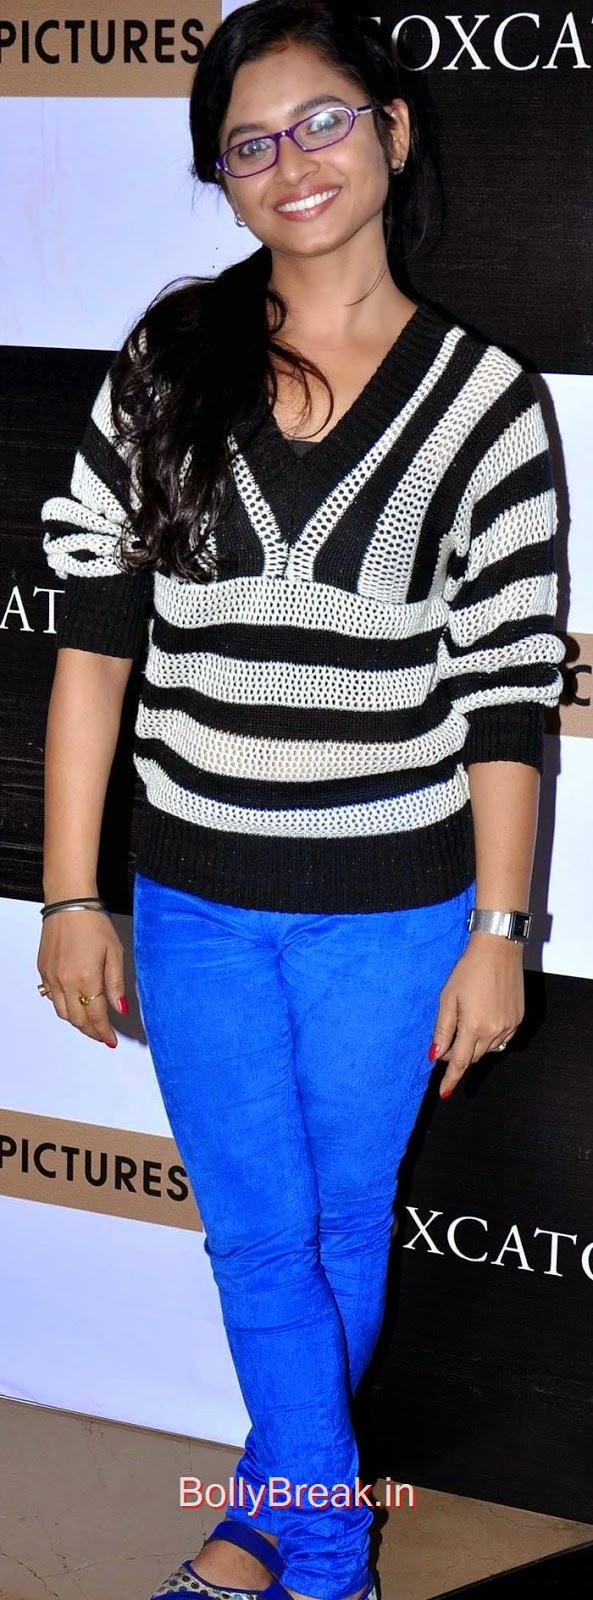 "Ekta Tiwari, Komal Jha, Yuvika Chowdary At ""Foxcatcher"" Premiere"